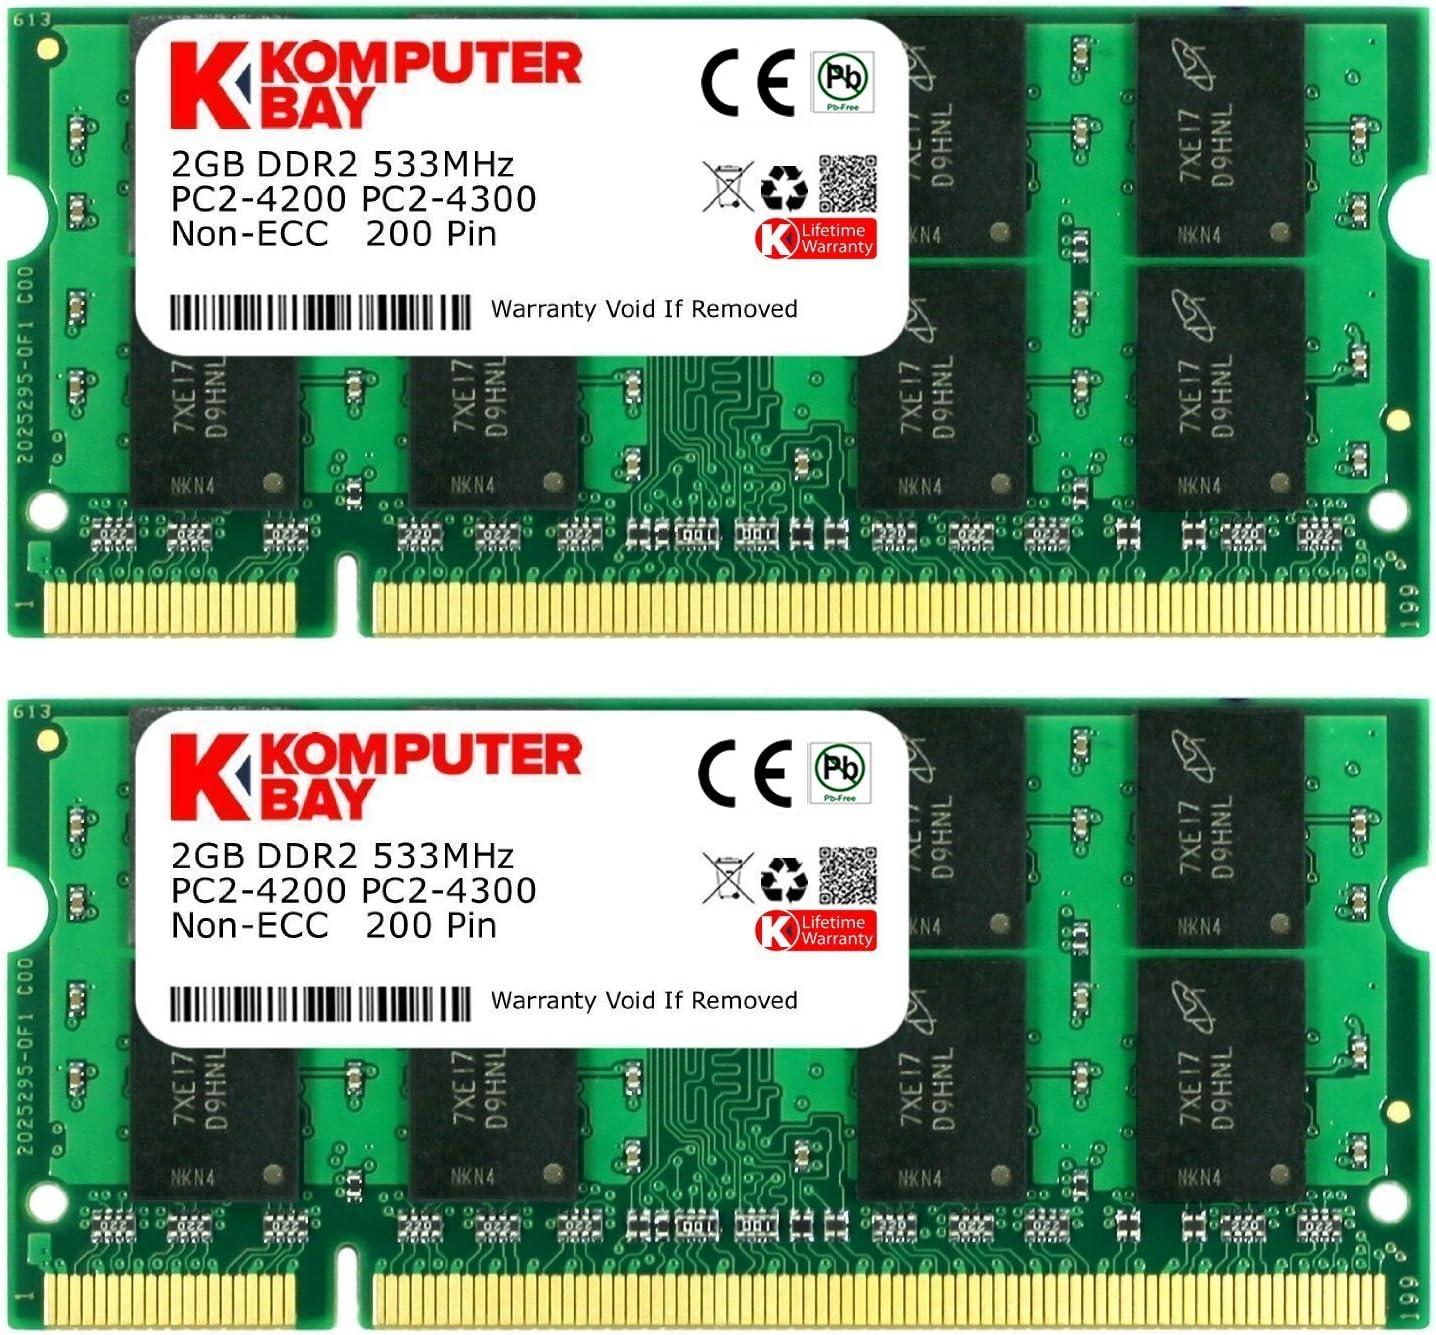 KOMPUTERBAY 4GB 2X 2GB DDR2 533MHz PC2-4200 PC2-4300 DDR2 533 (200 PIN) SODIMM Laptop Memory